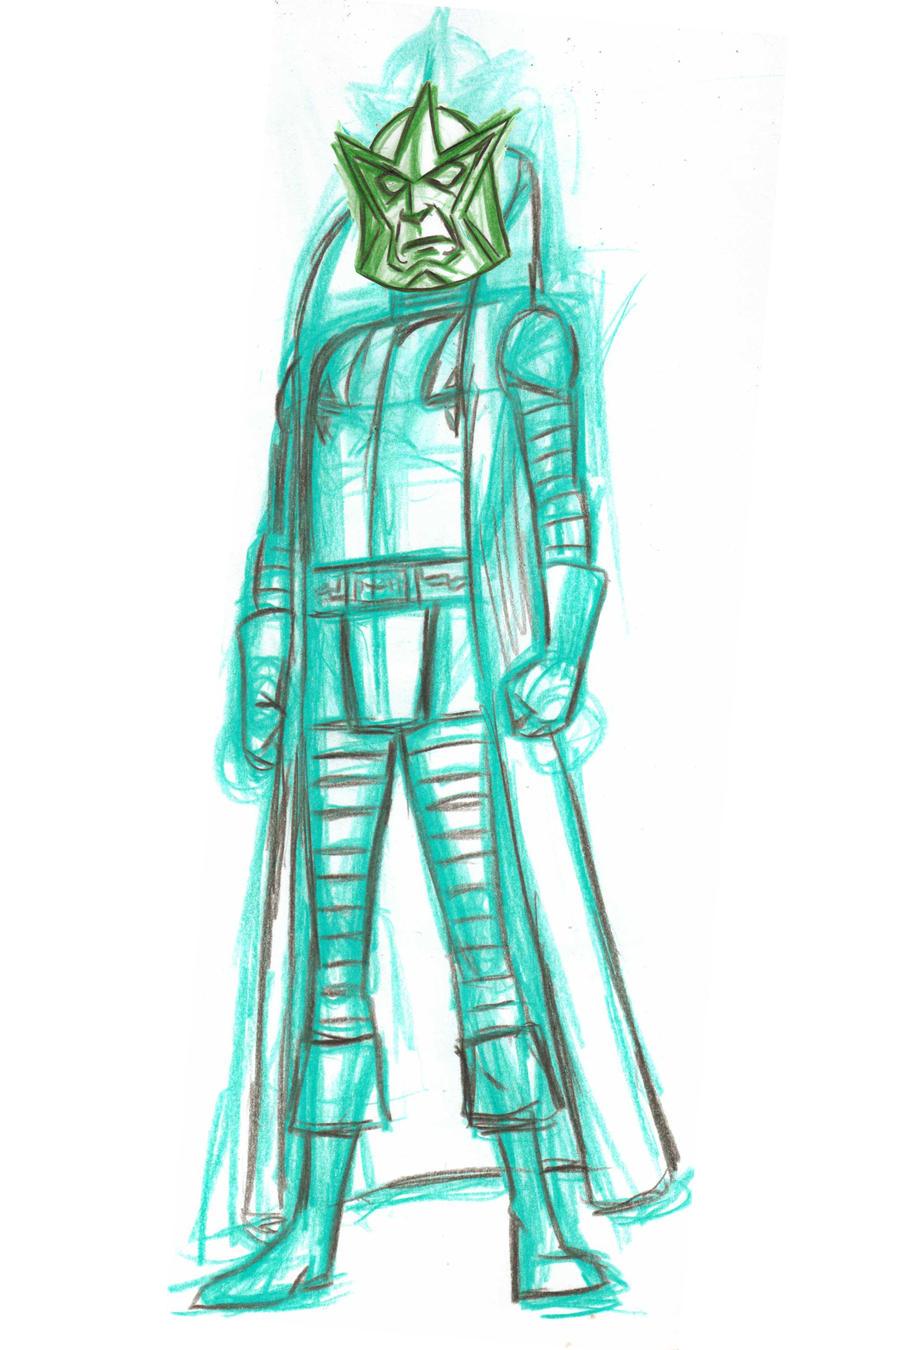 mastar sketch by AlanSchell